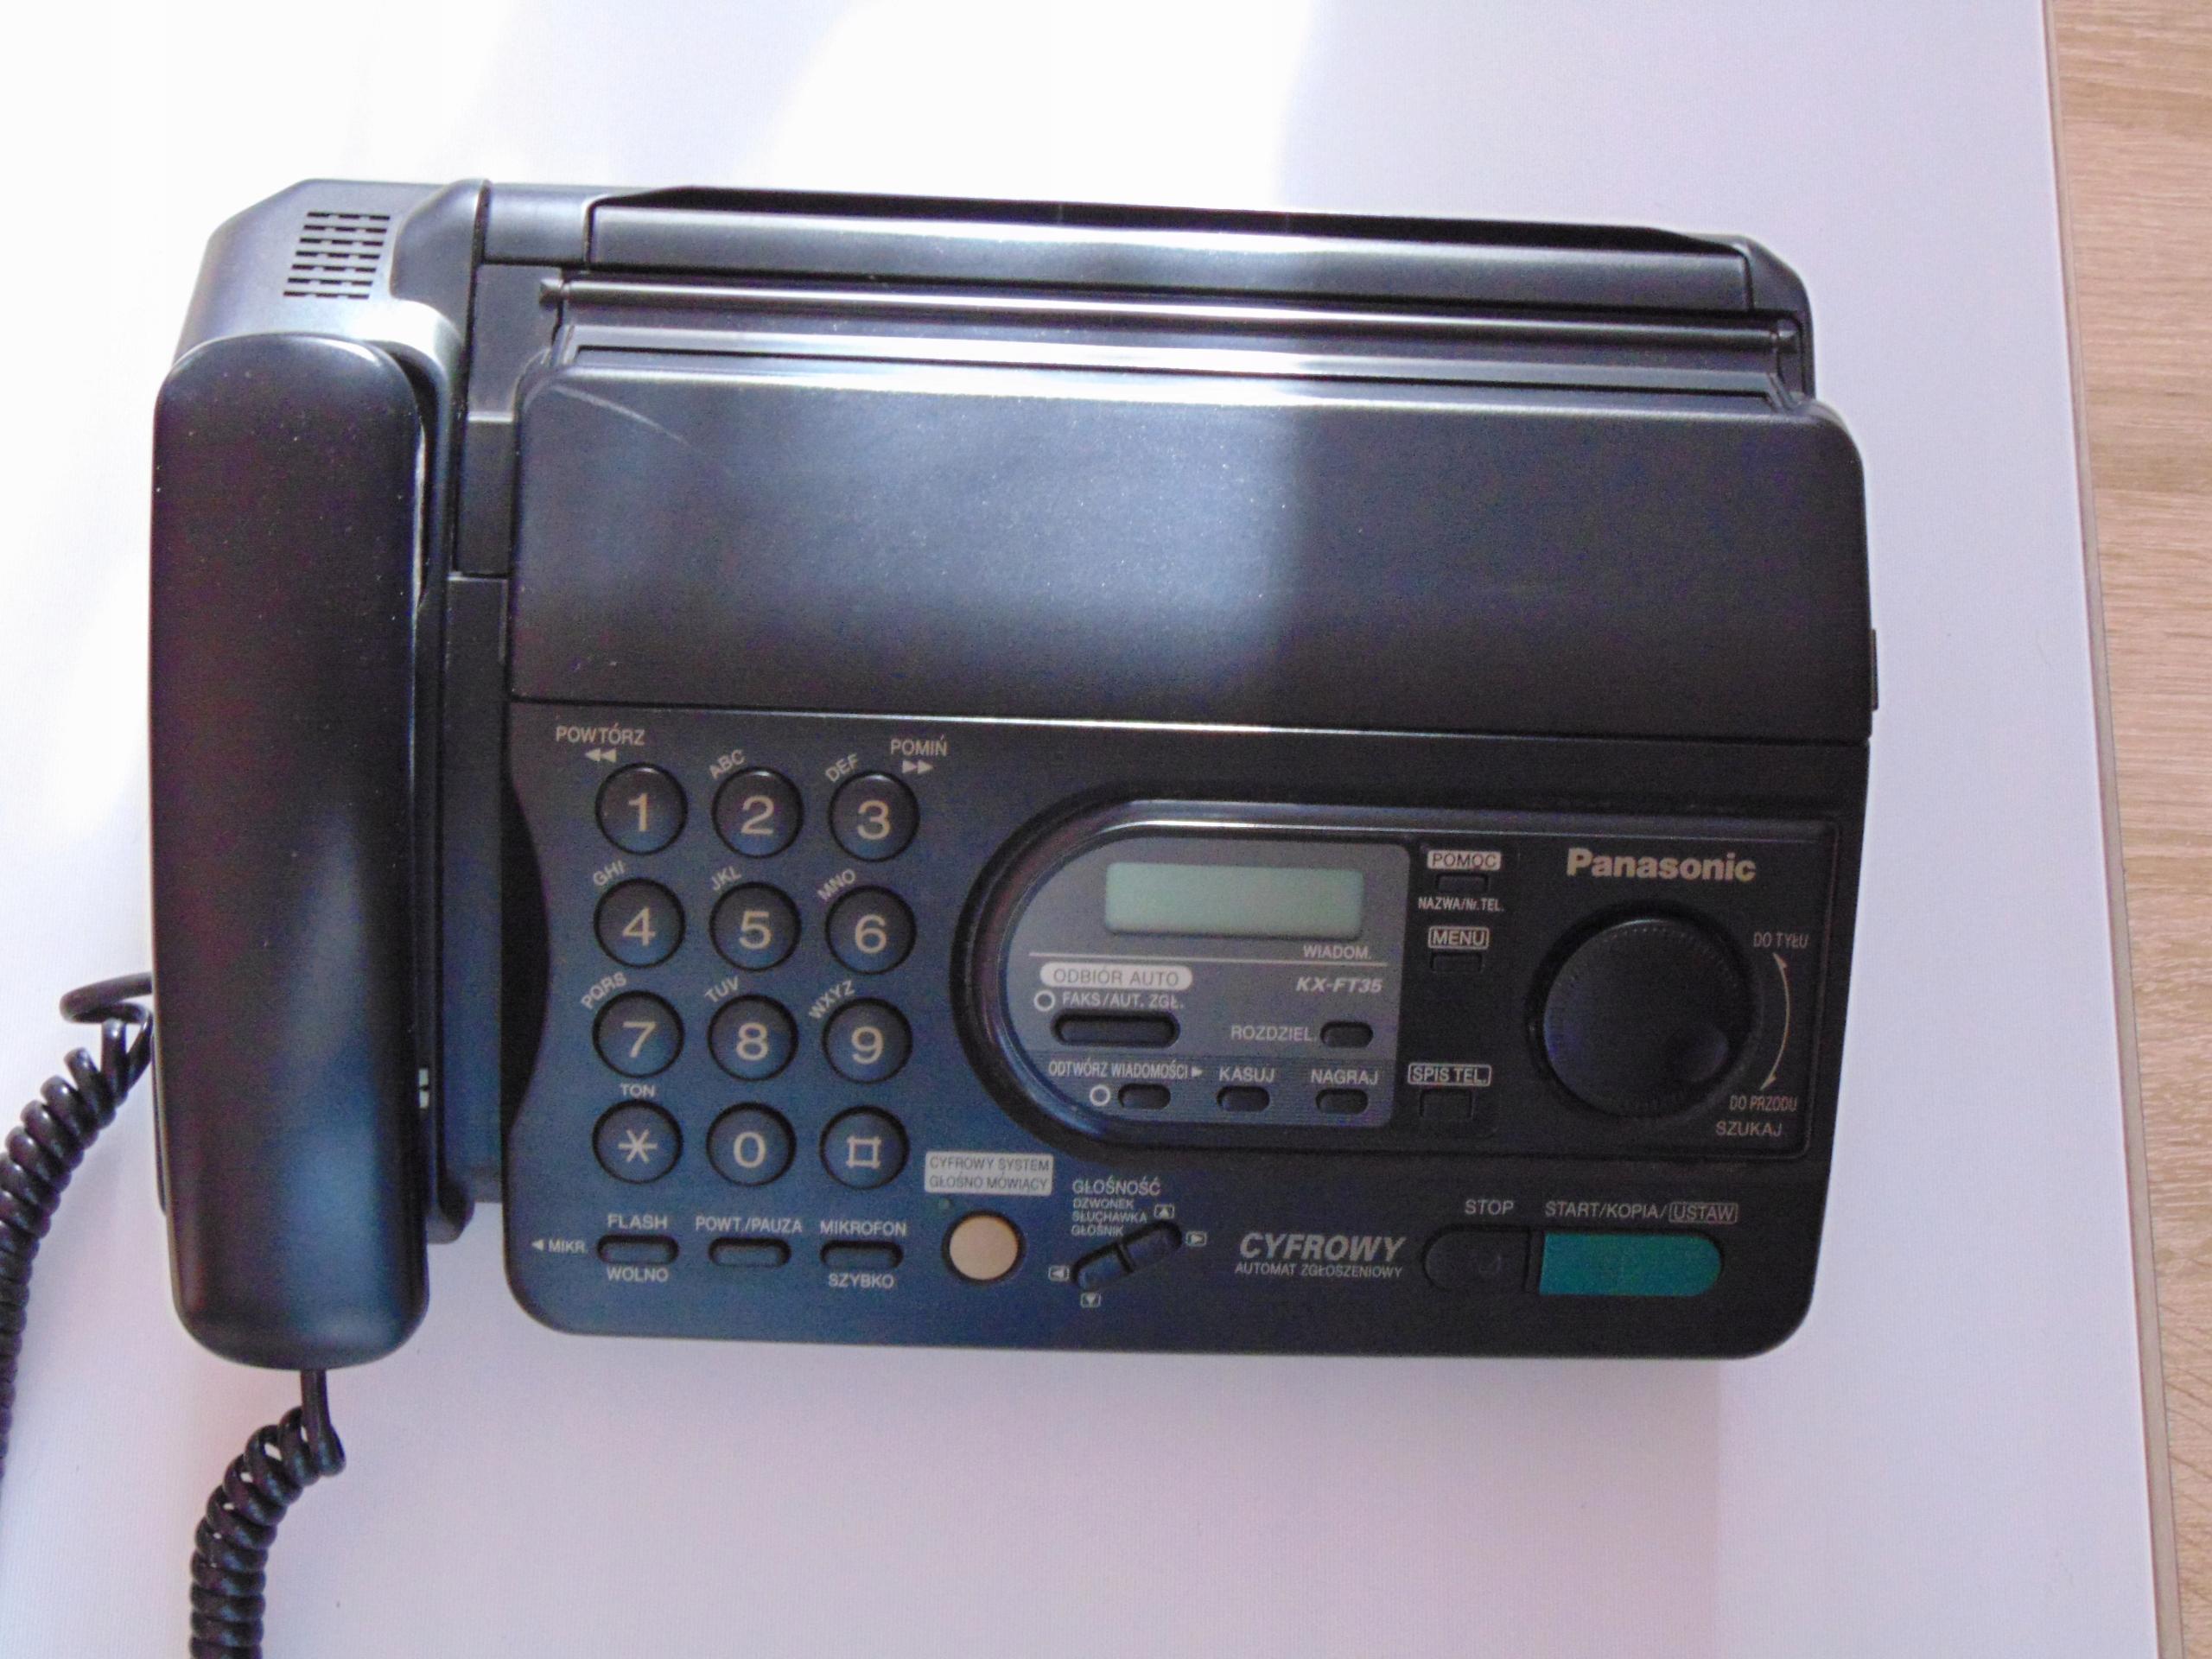 Fax cyfrowy Panasonic KX-FT35PD.